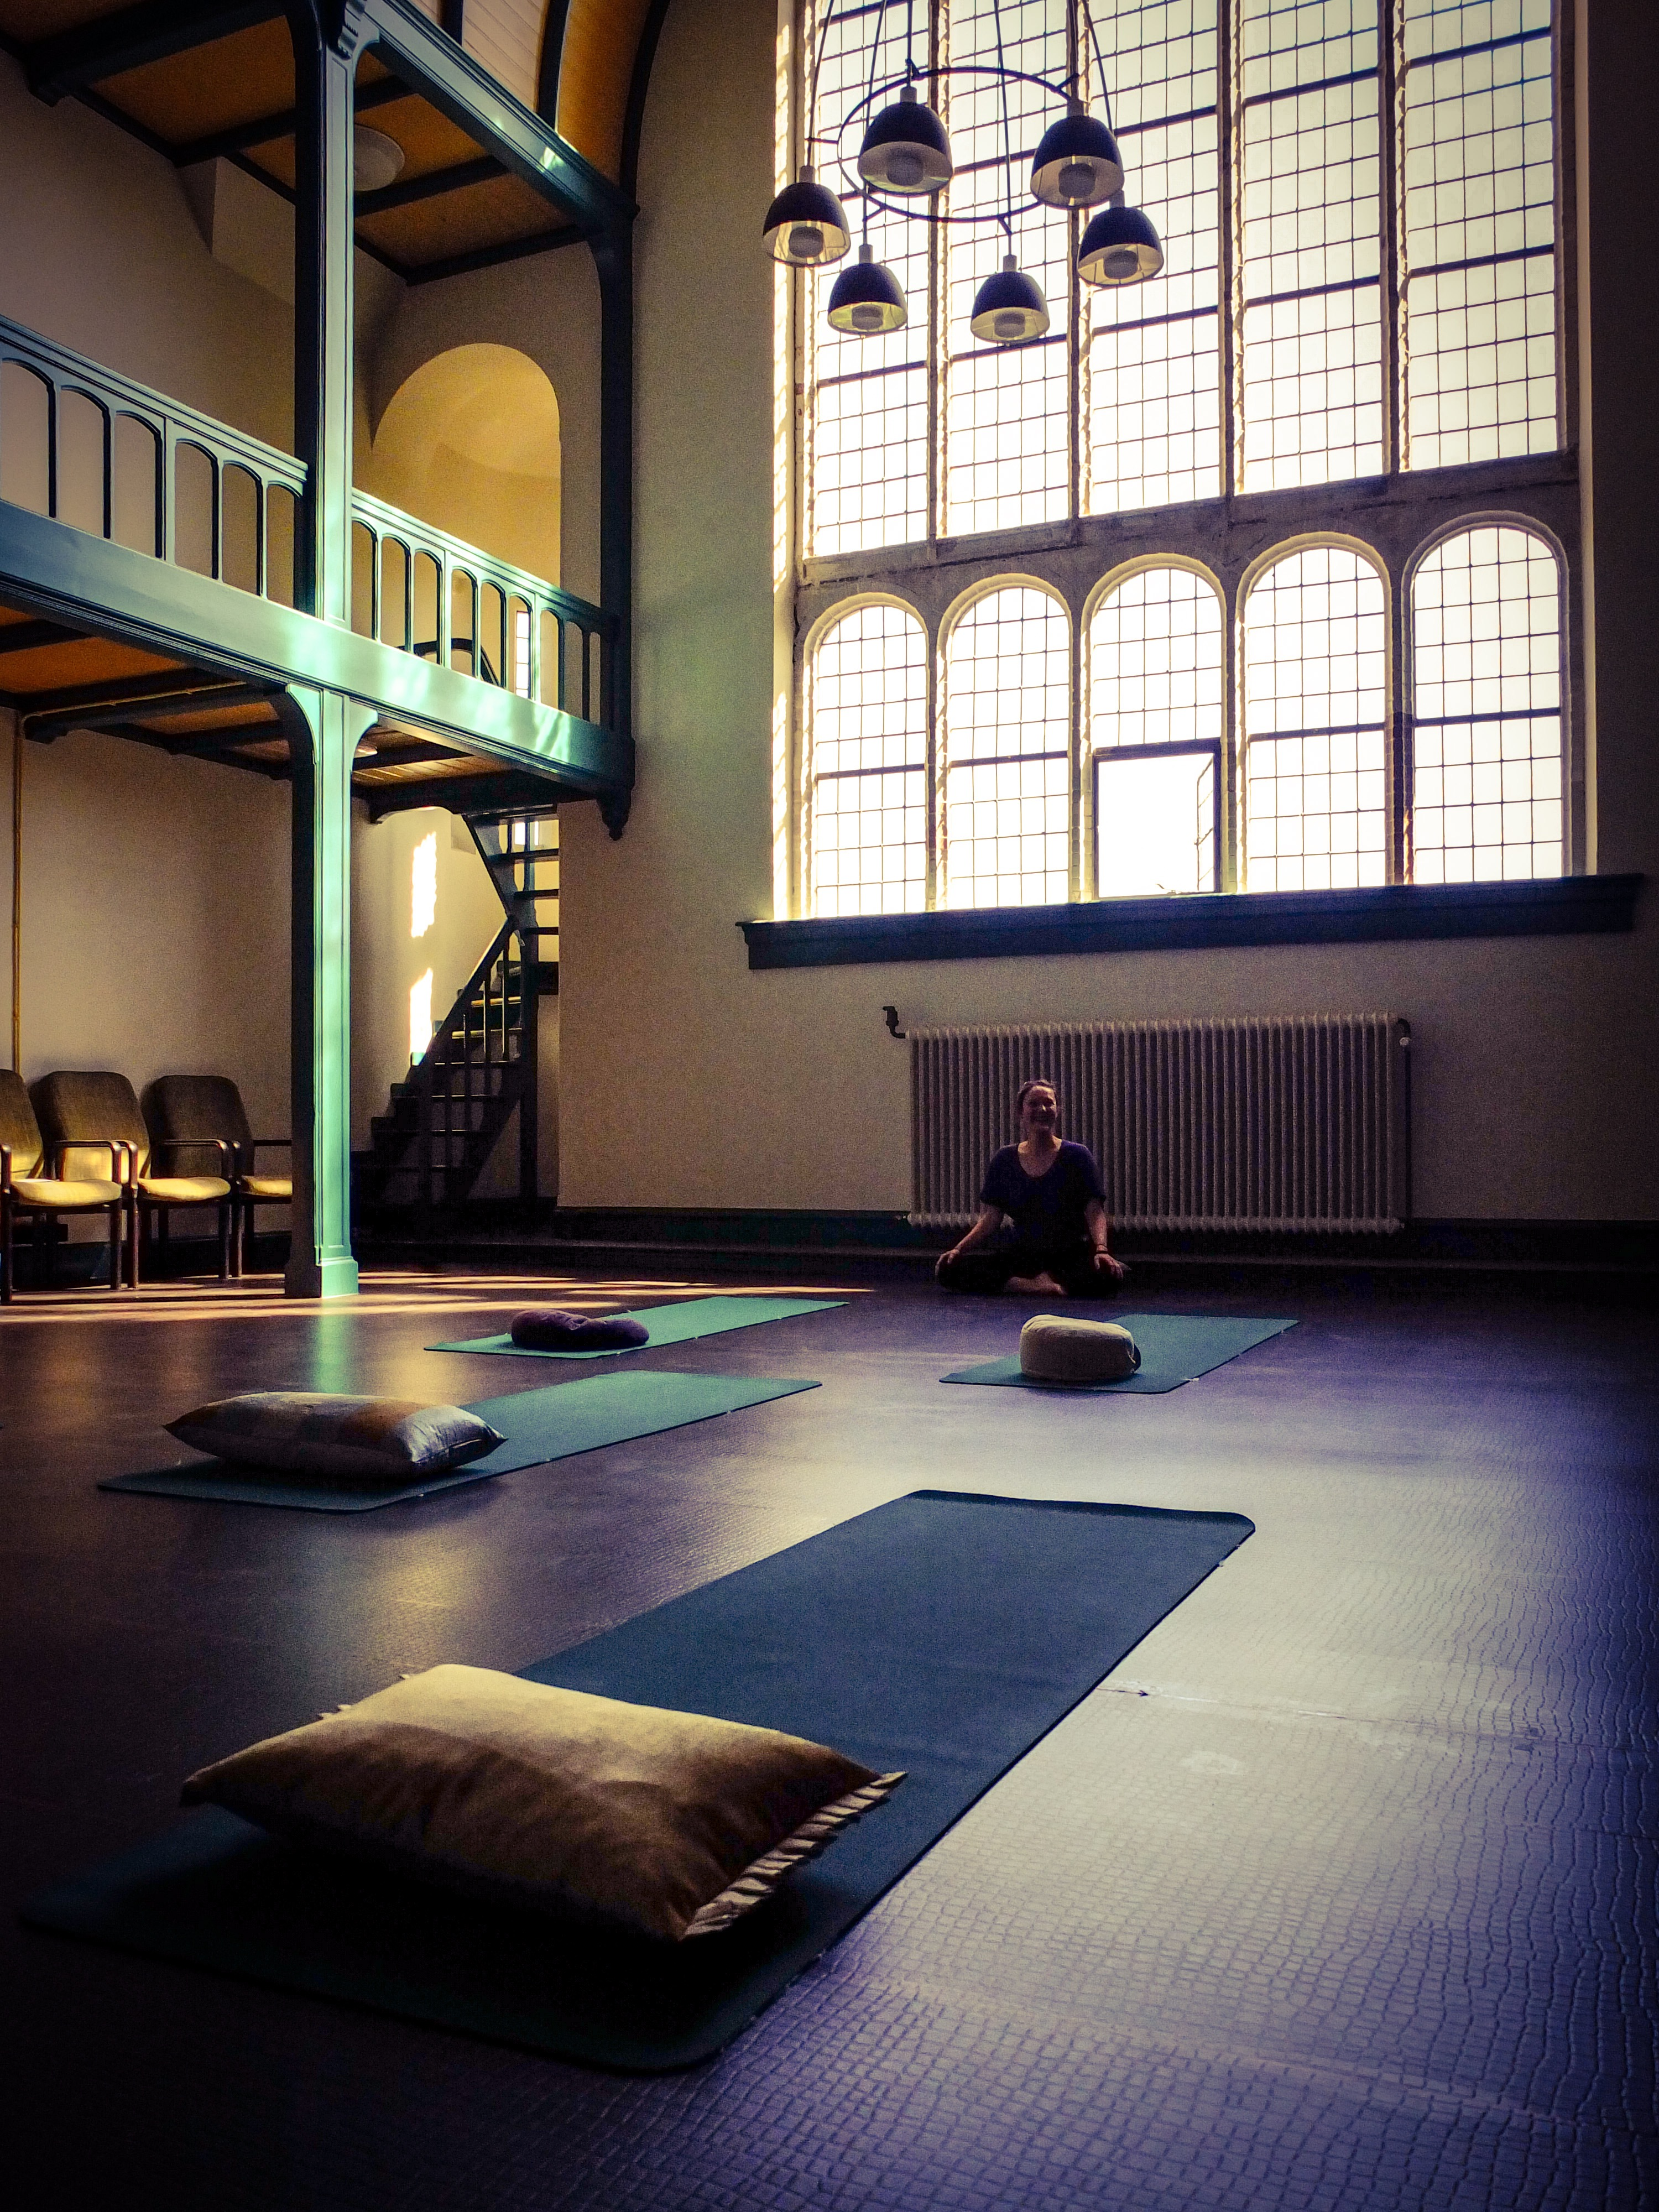 Sacred Trees Spiritual Studio - Readings, yoga, regression, mediumship, meditation